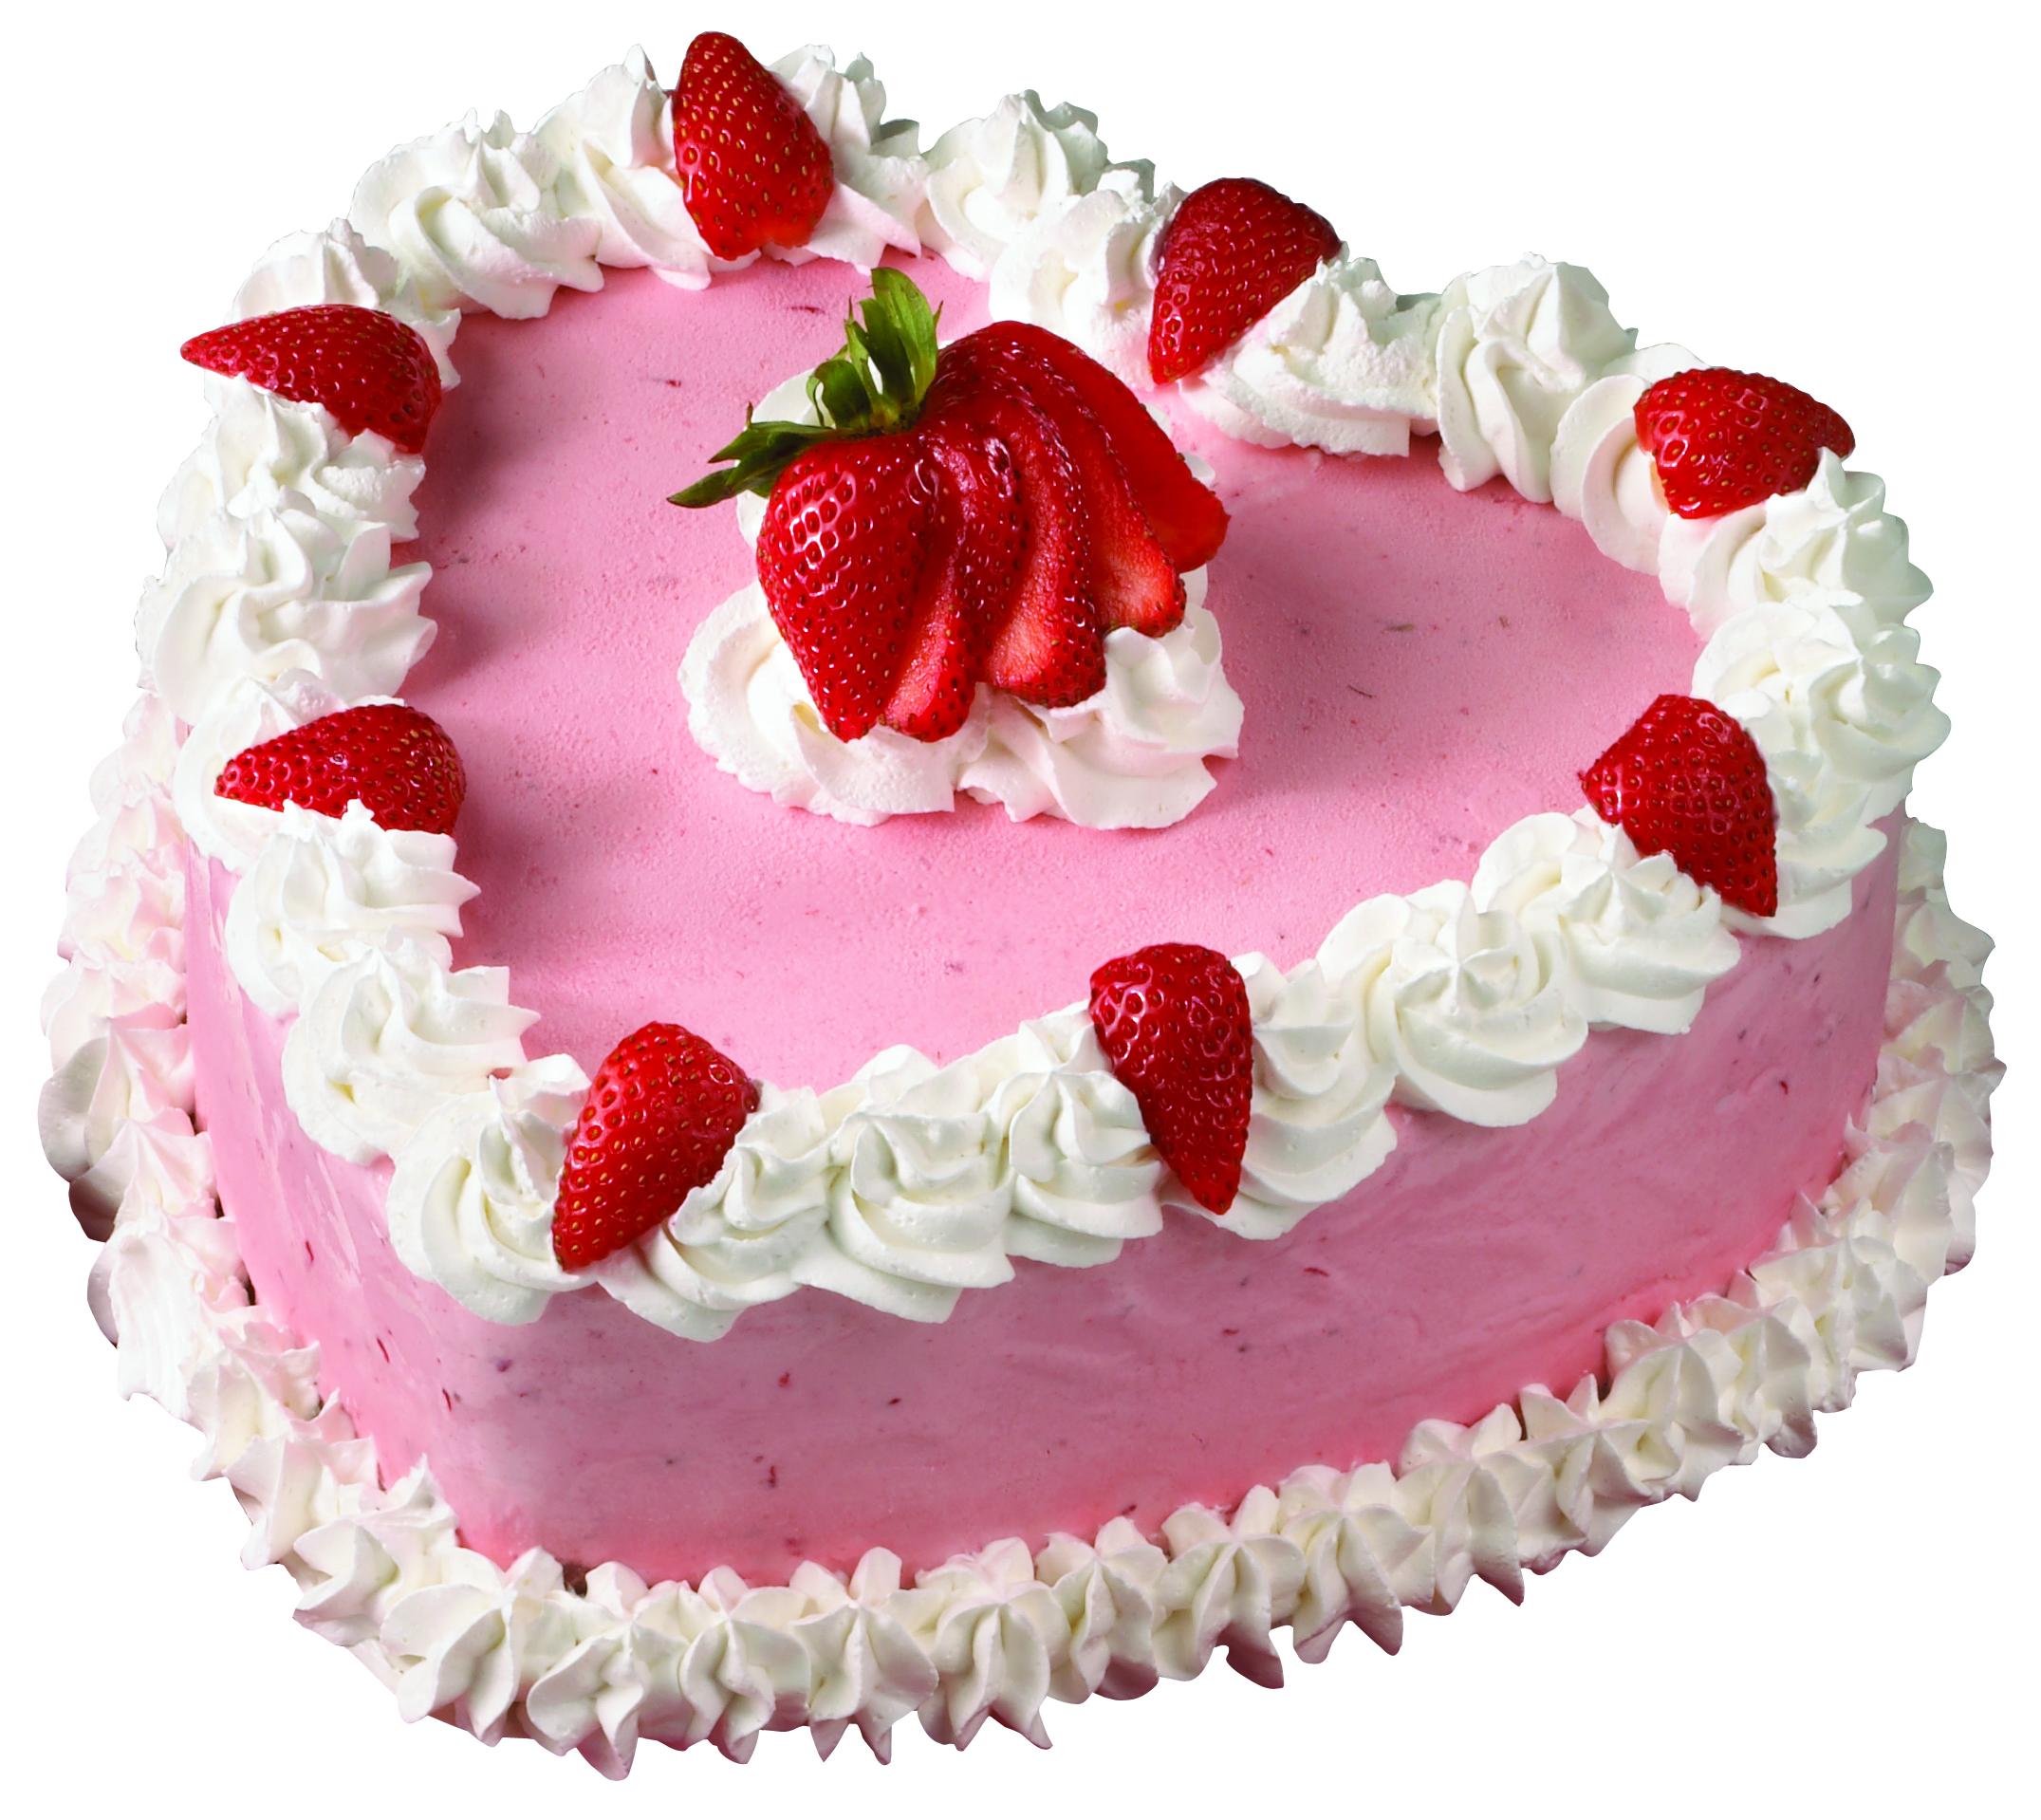 Best Ice Cream Cake From Marble Slab